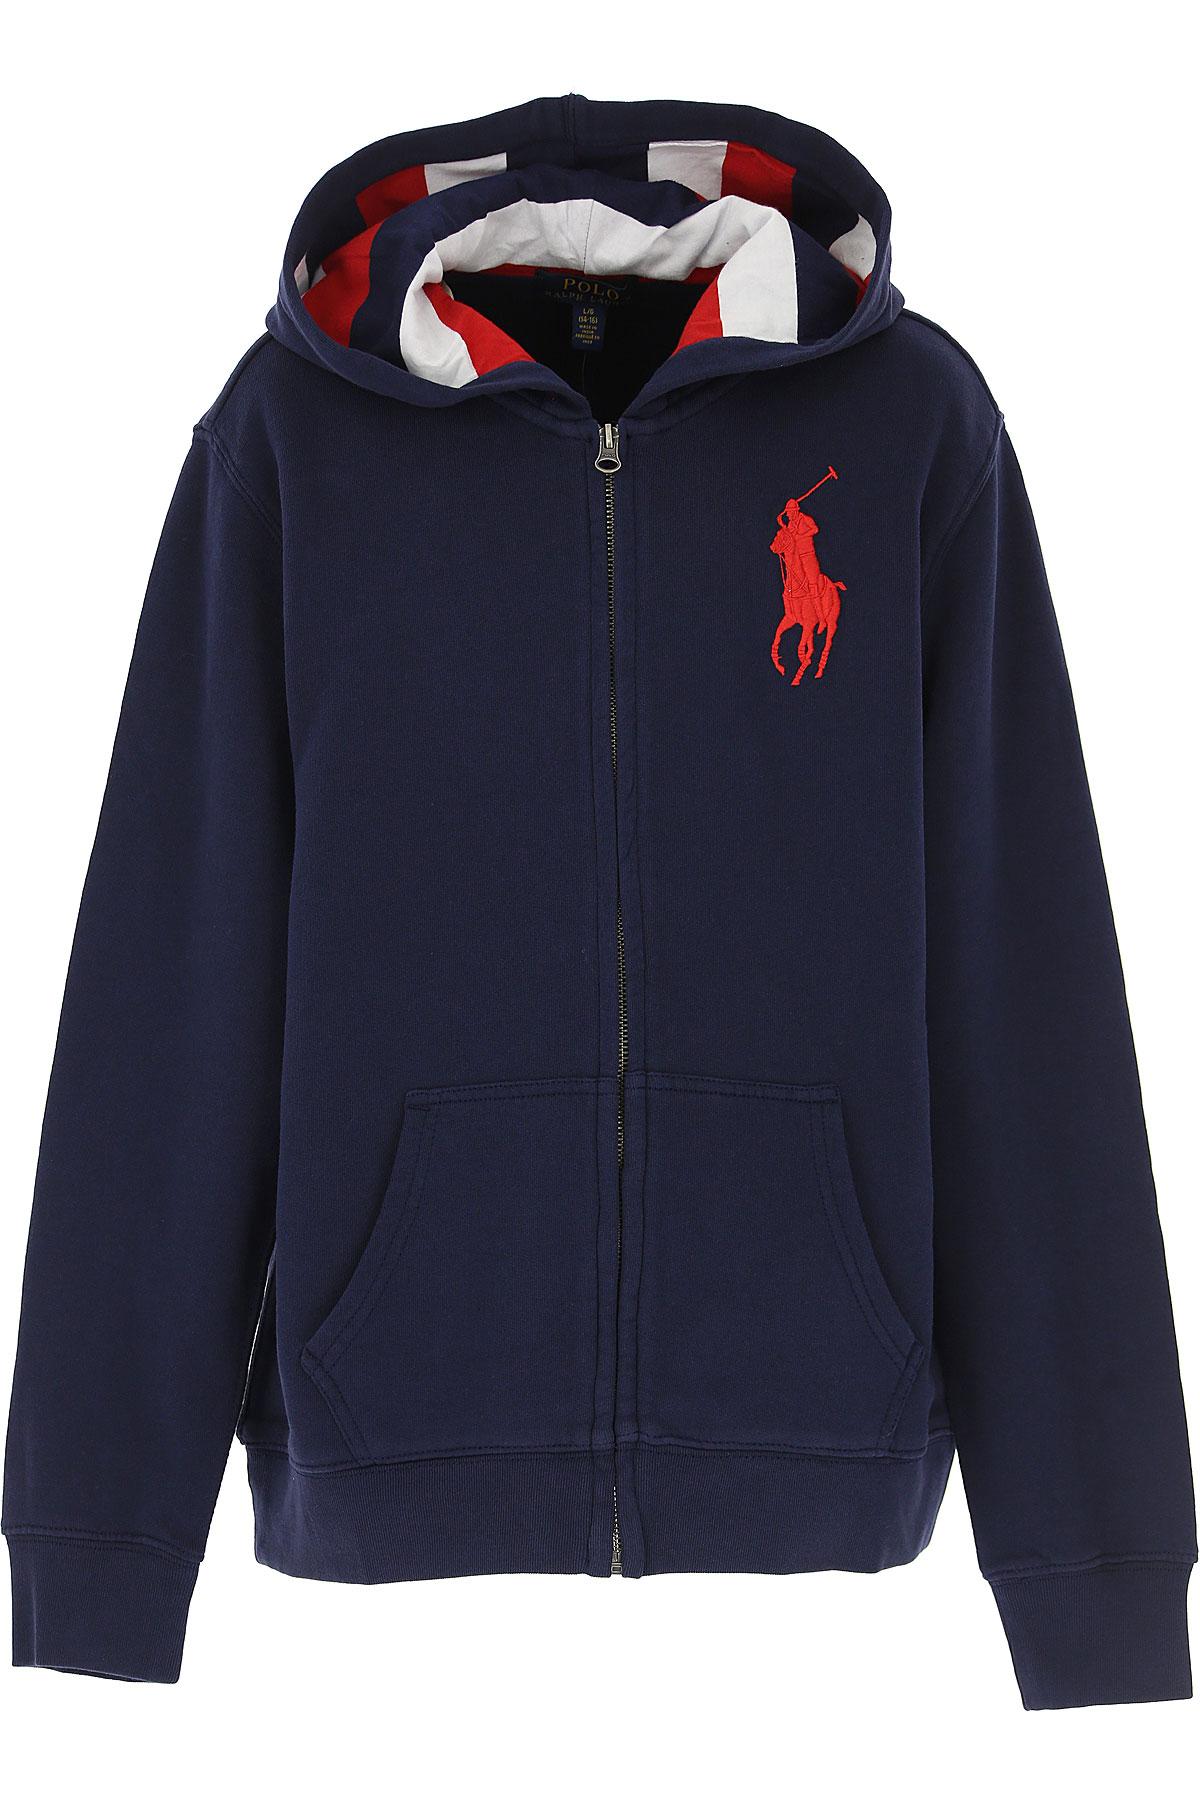 a725e5285af9 Ralph Lauren. Boys Clothing